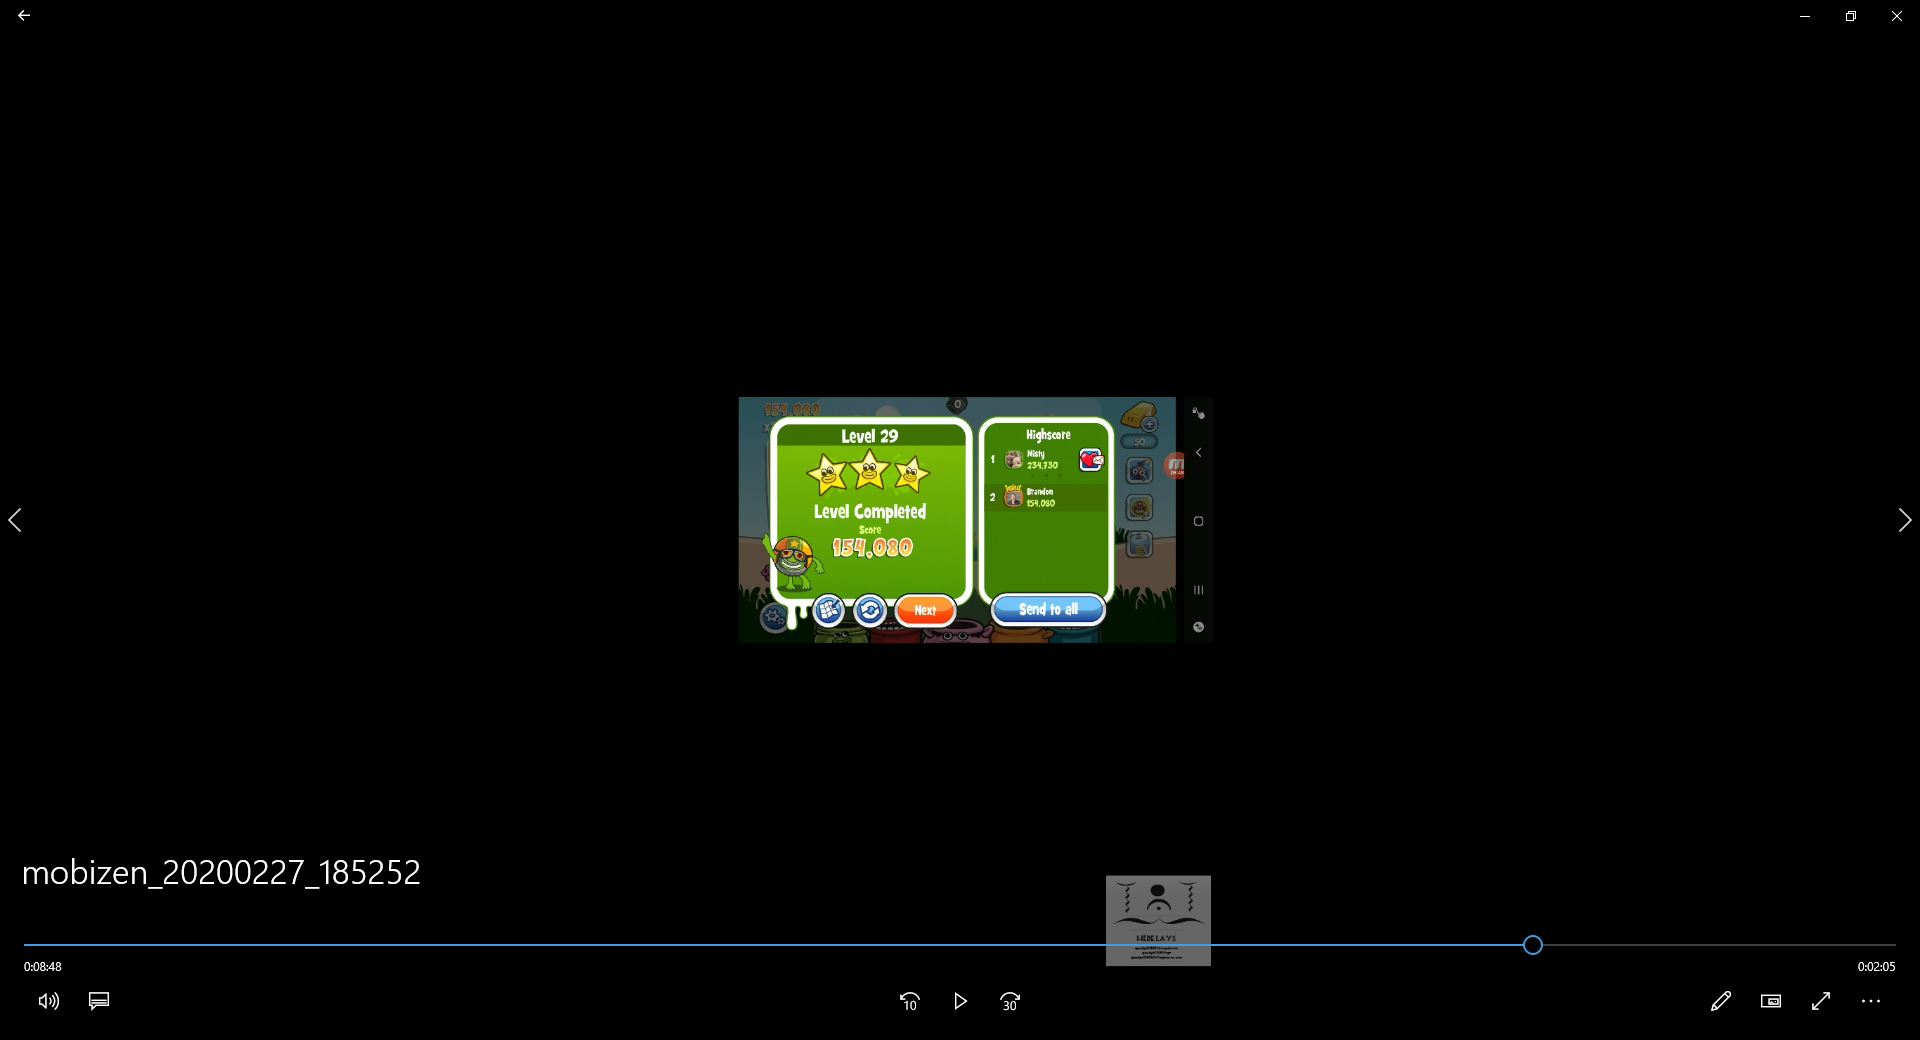 speedy4759123: Papa Pear Saga: Level 029 (Android) 154,080 points on 2020-03-04 08:07:45